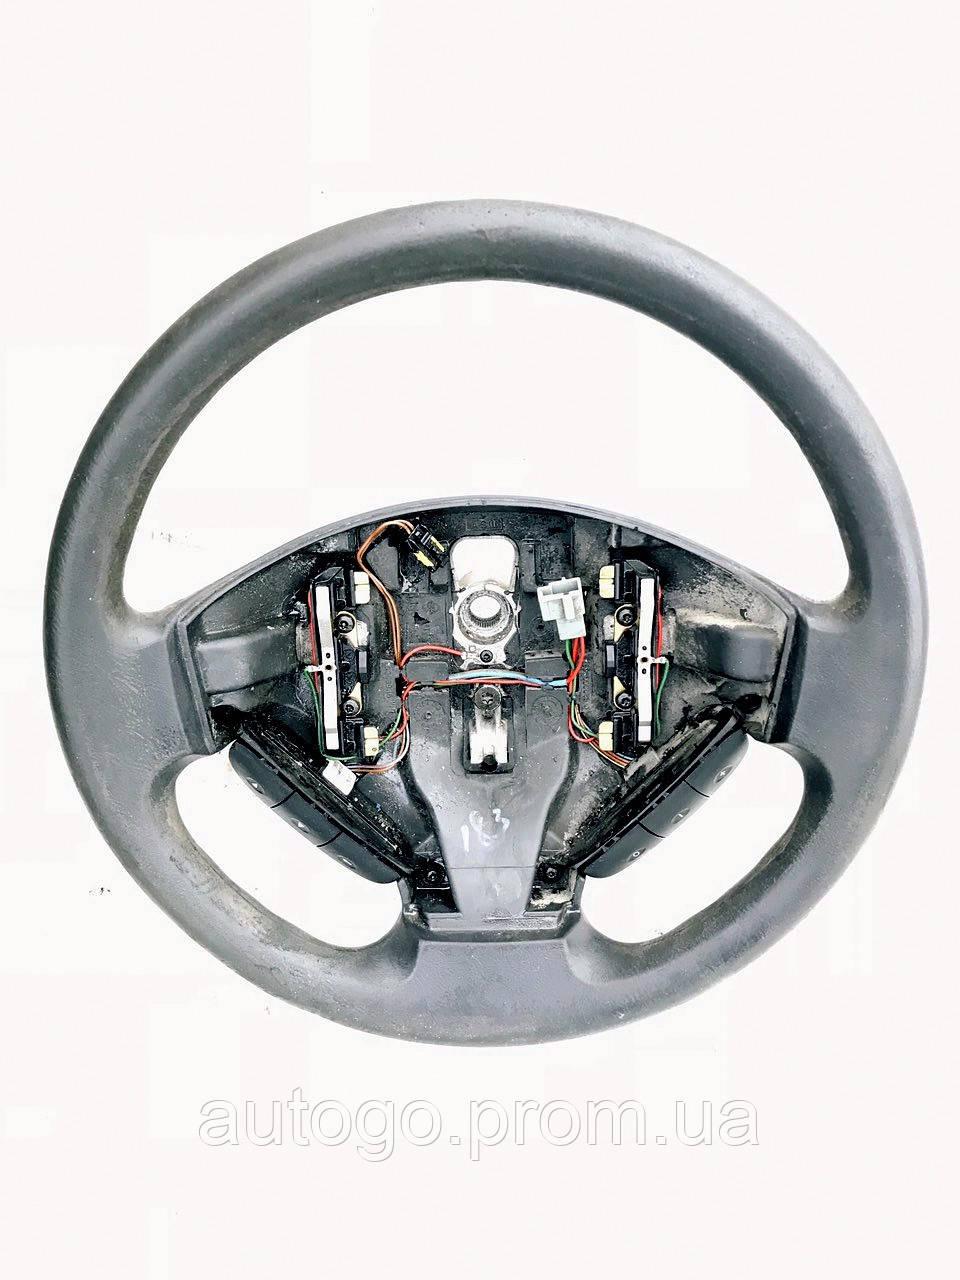 Мультируль Руль Opel Vivaro Nissan Primastar Renault Trafic